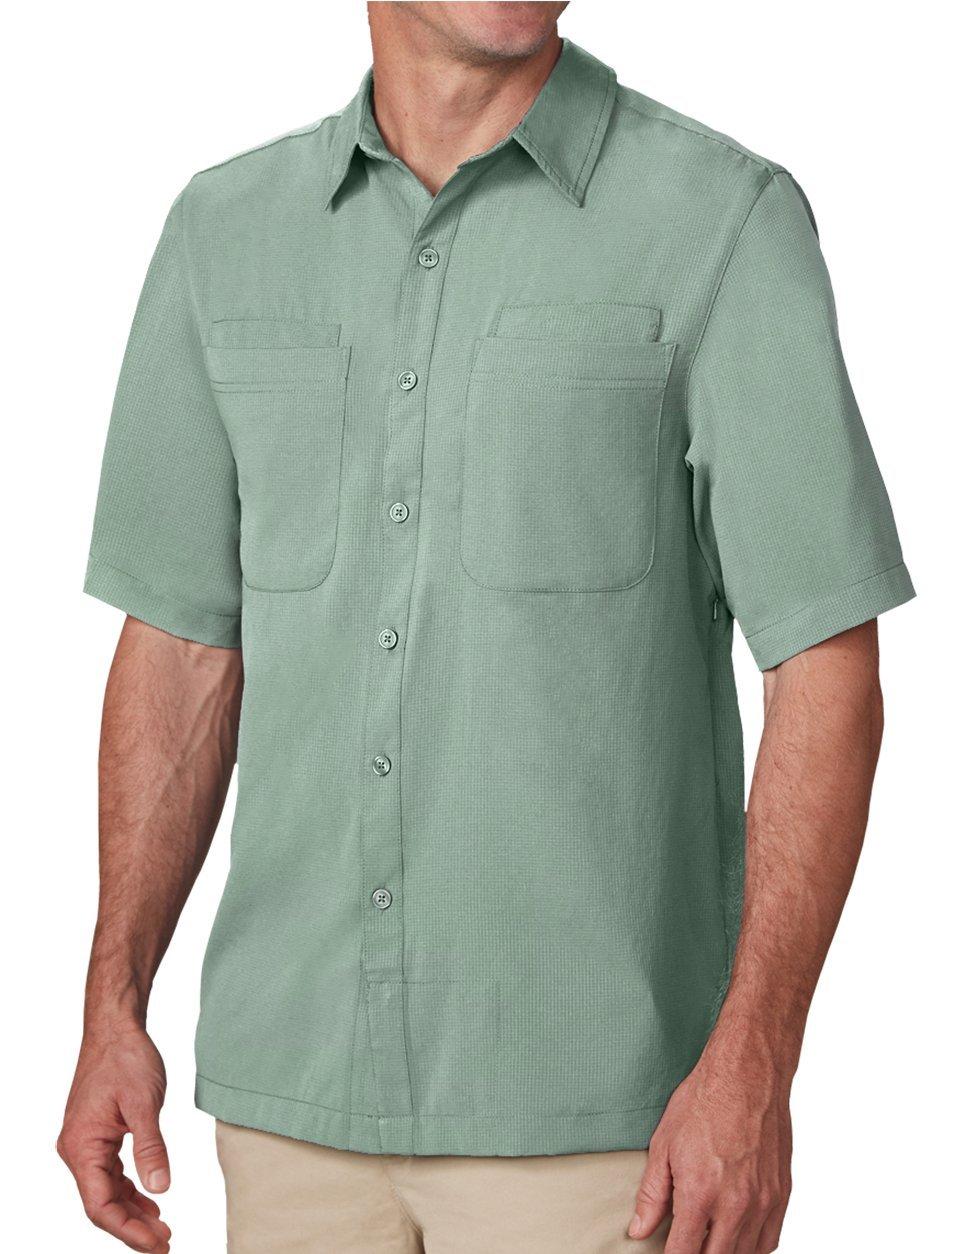 SCOTTeVEST Beachcomber Shirt - Travel Clothing TYM M